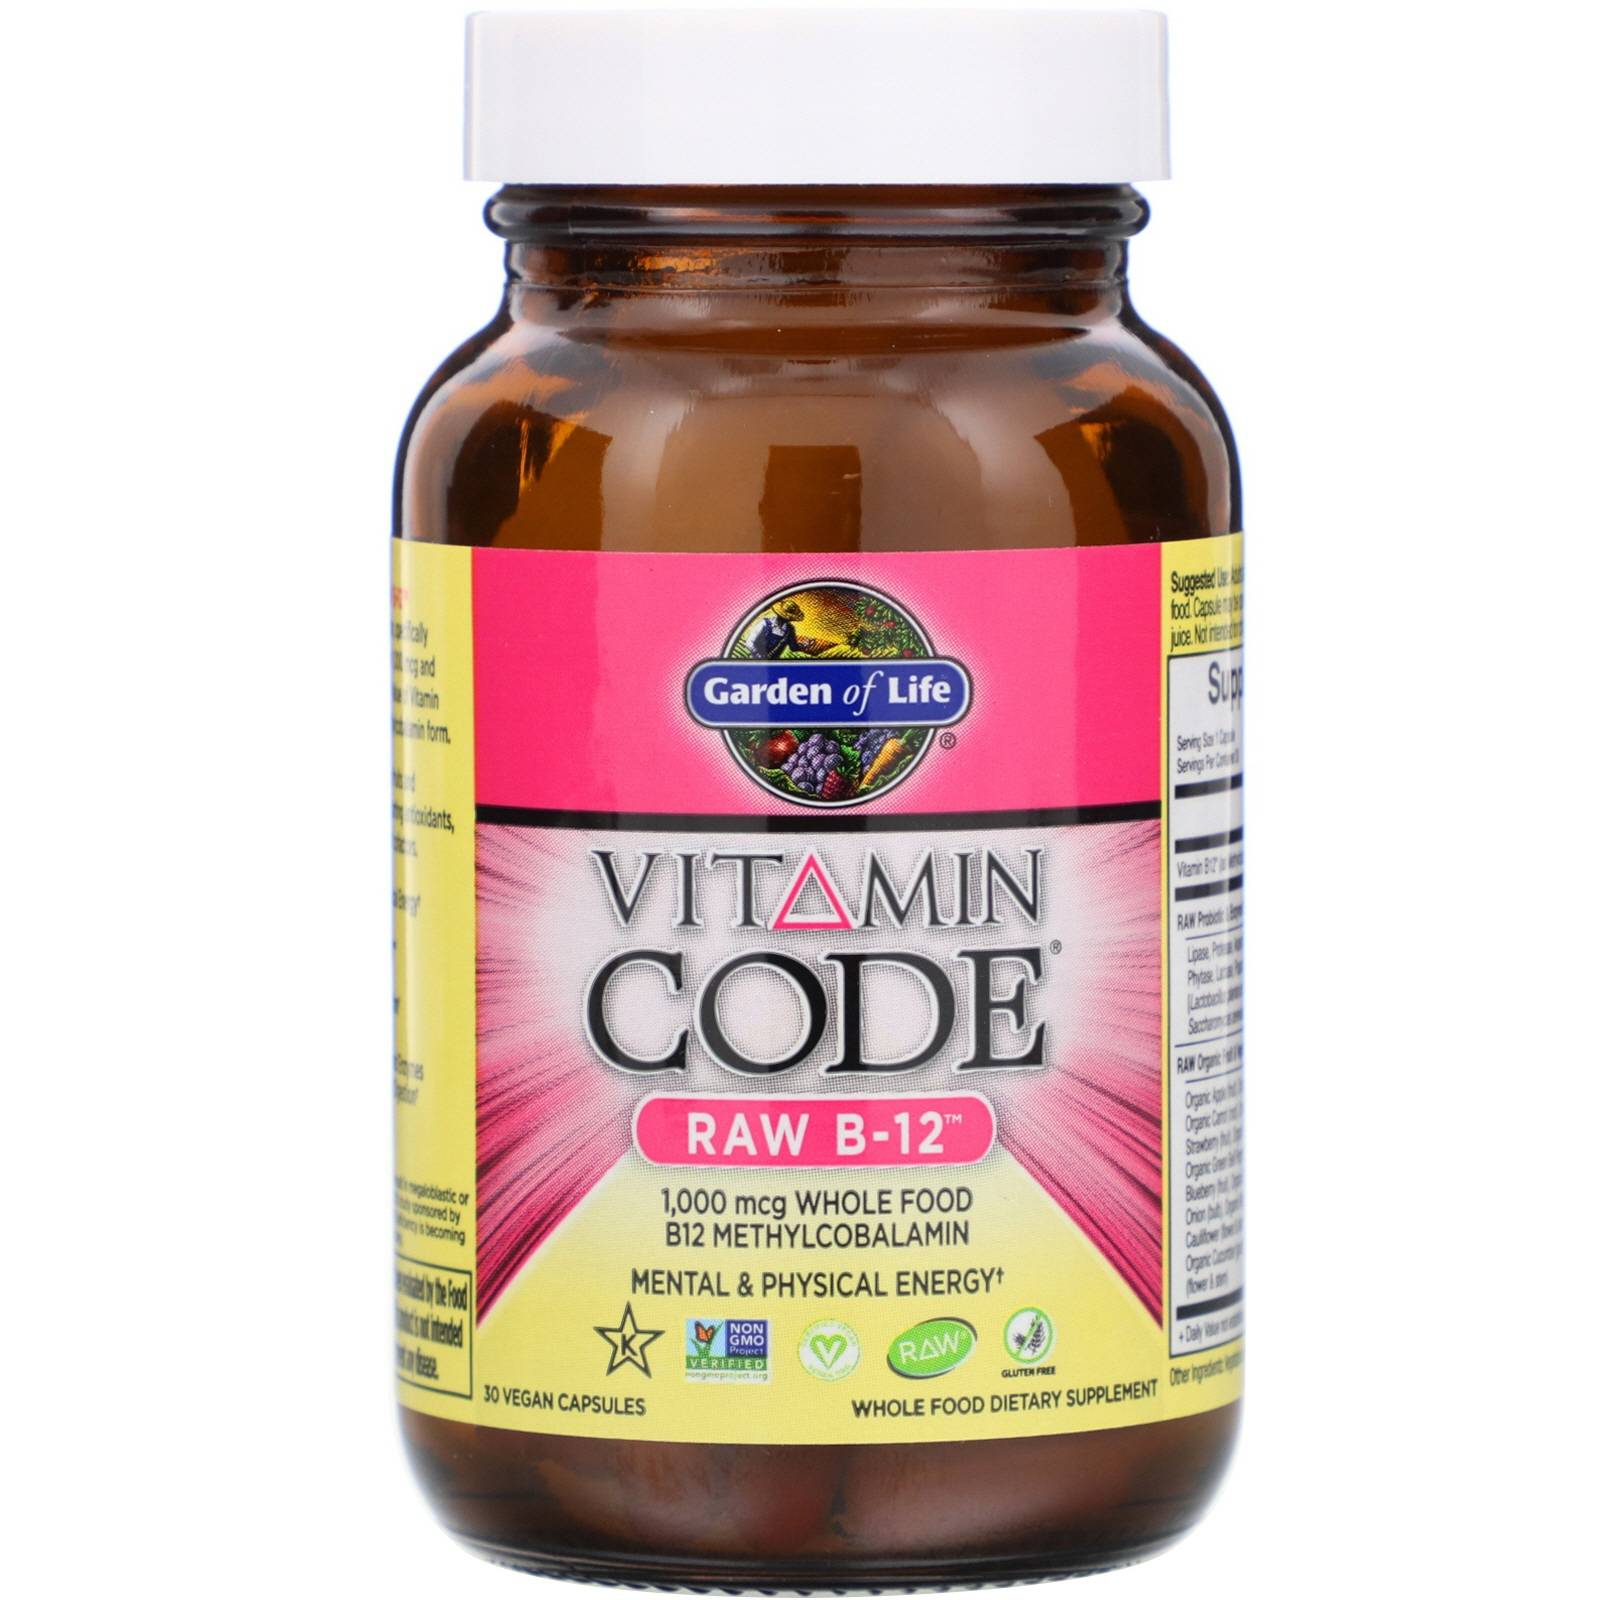 Garden of Life Vitamin Code - Raw B-12 (30 Vegetarian Capsules) - Garden of Life